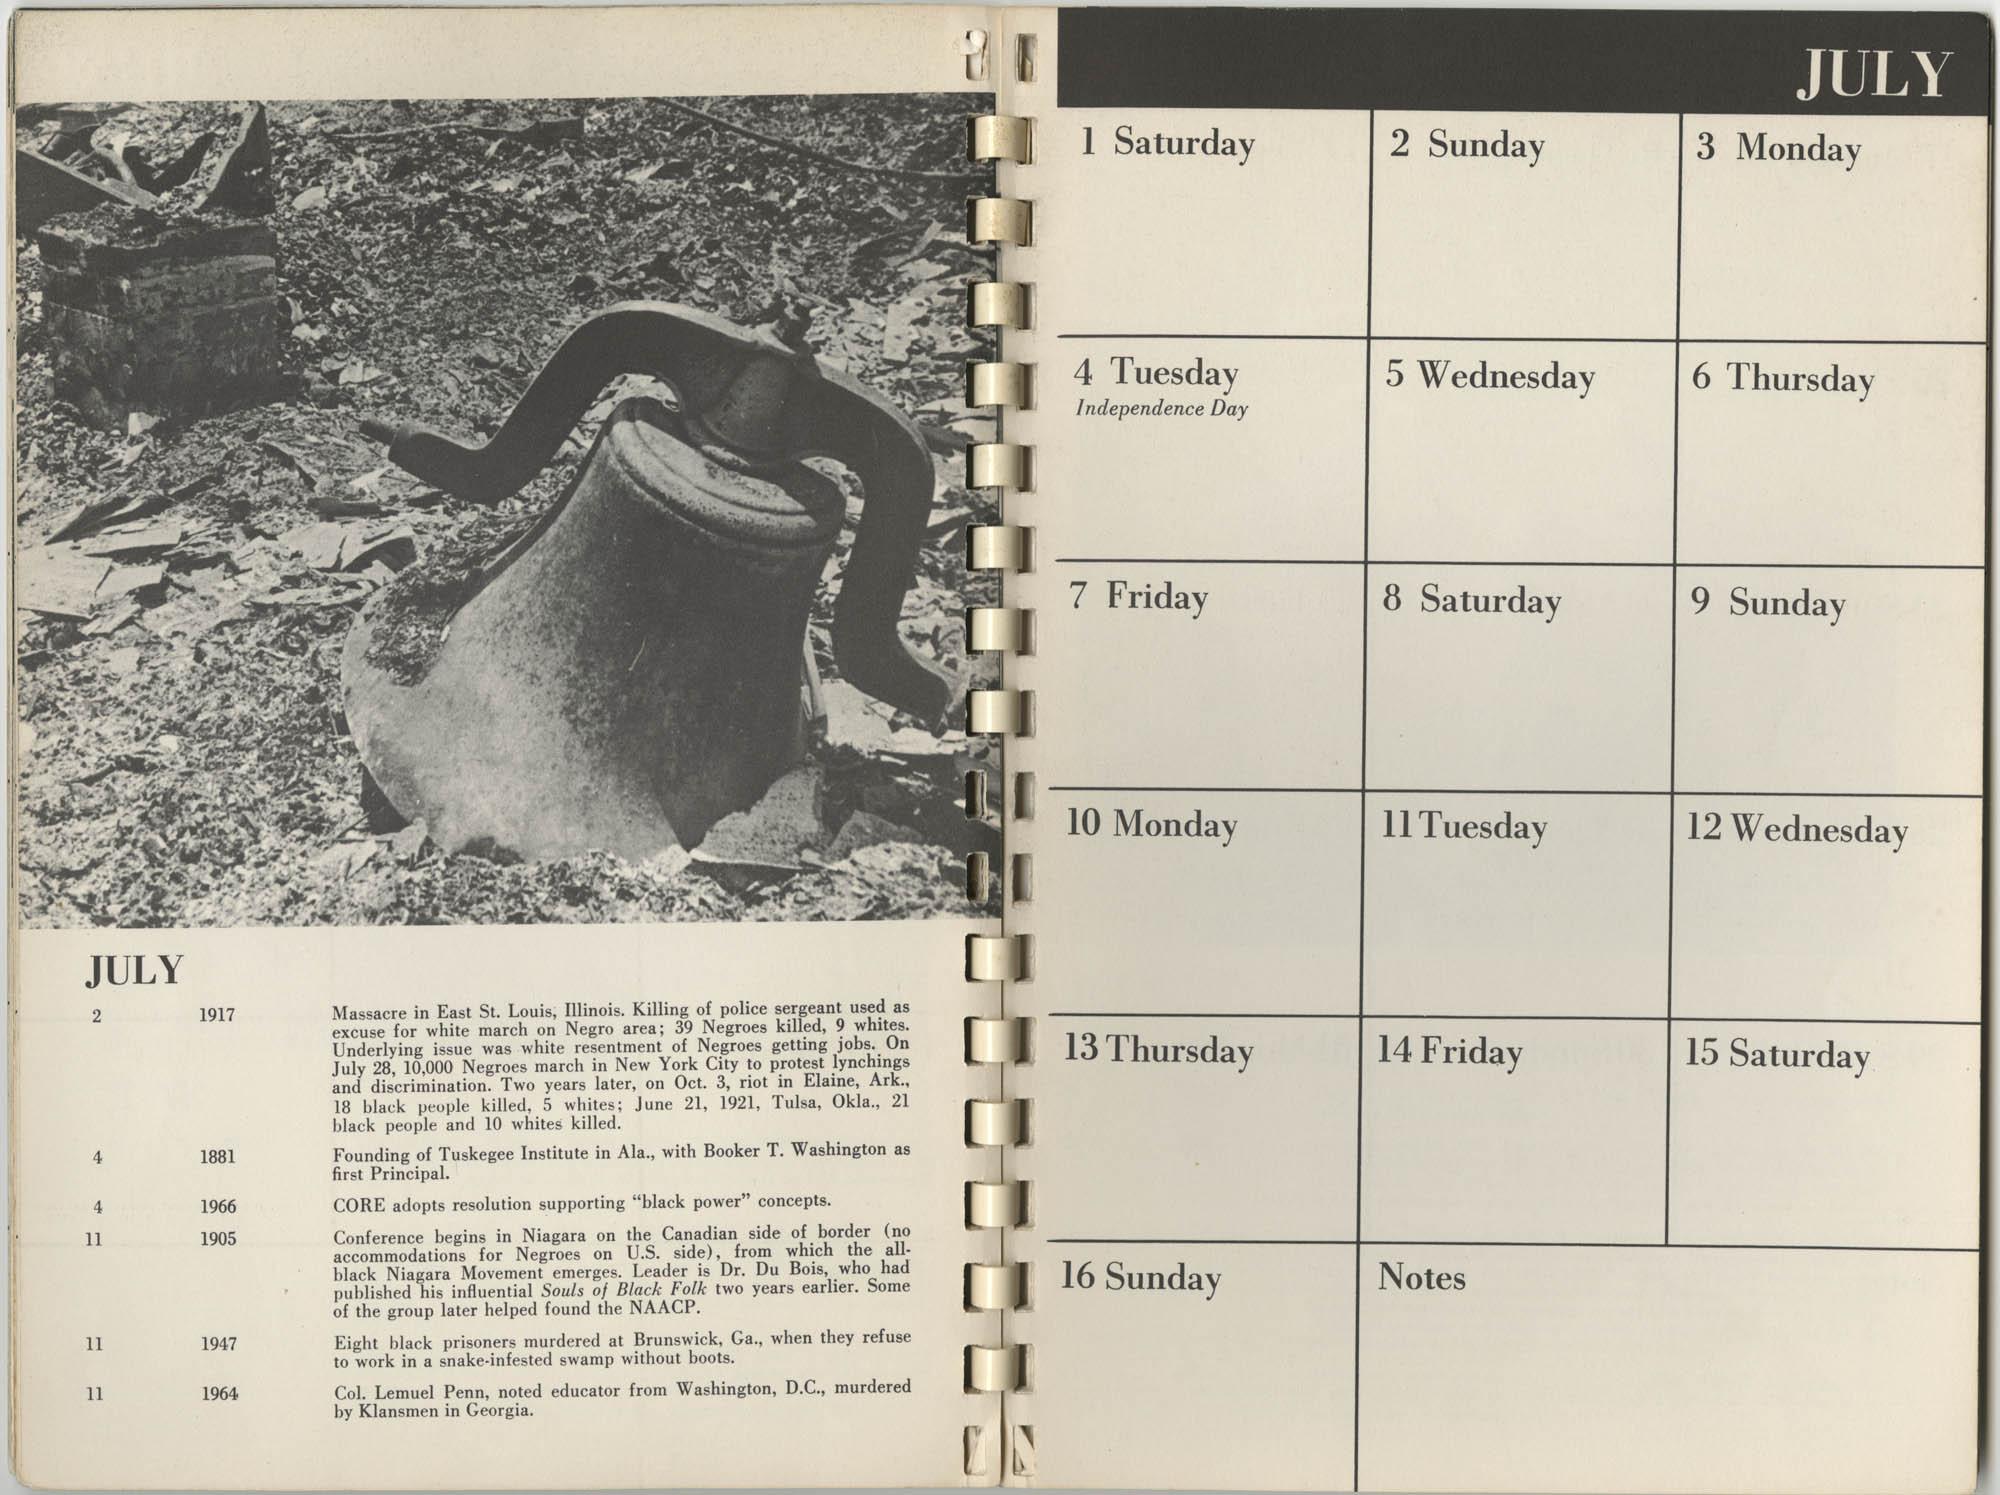 1967 SNCC Calendar, July 1-16